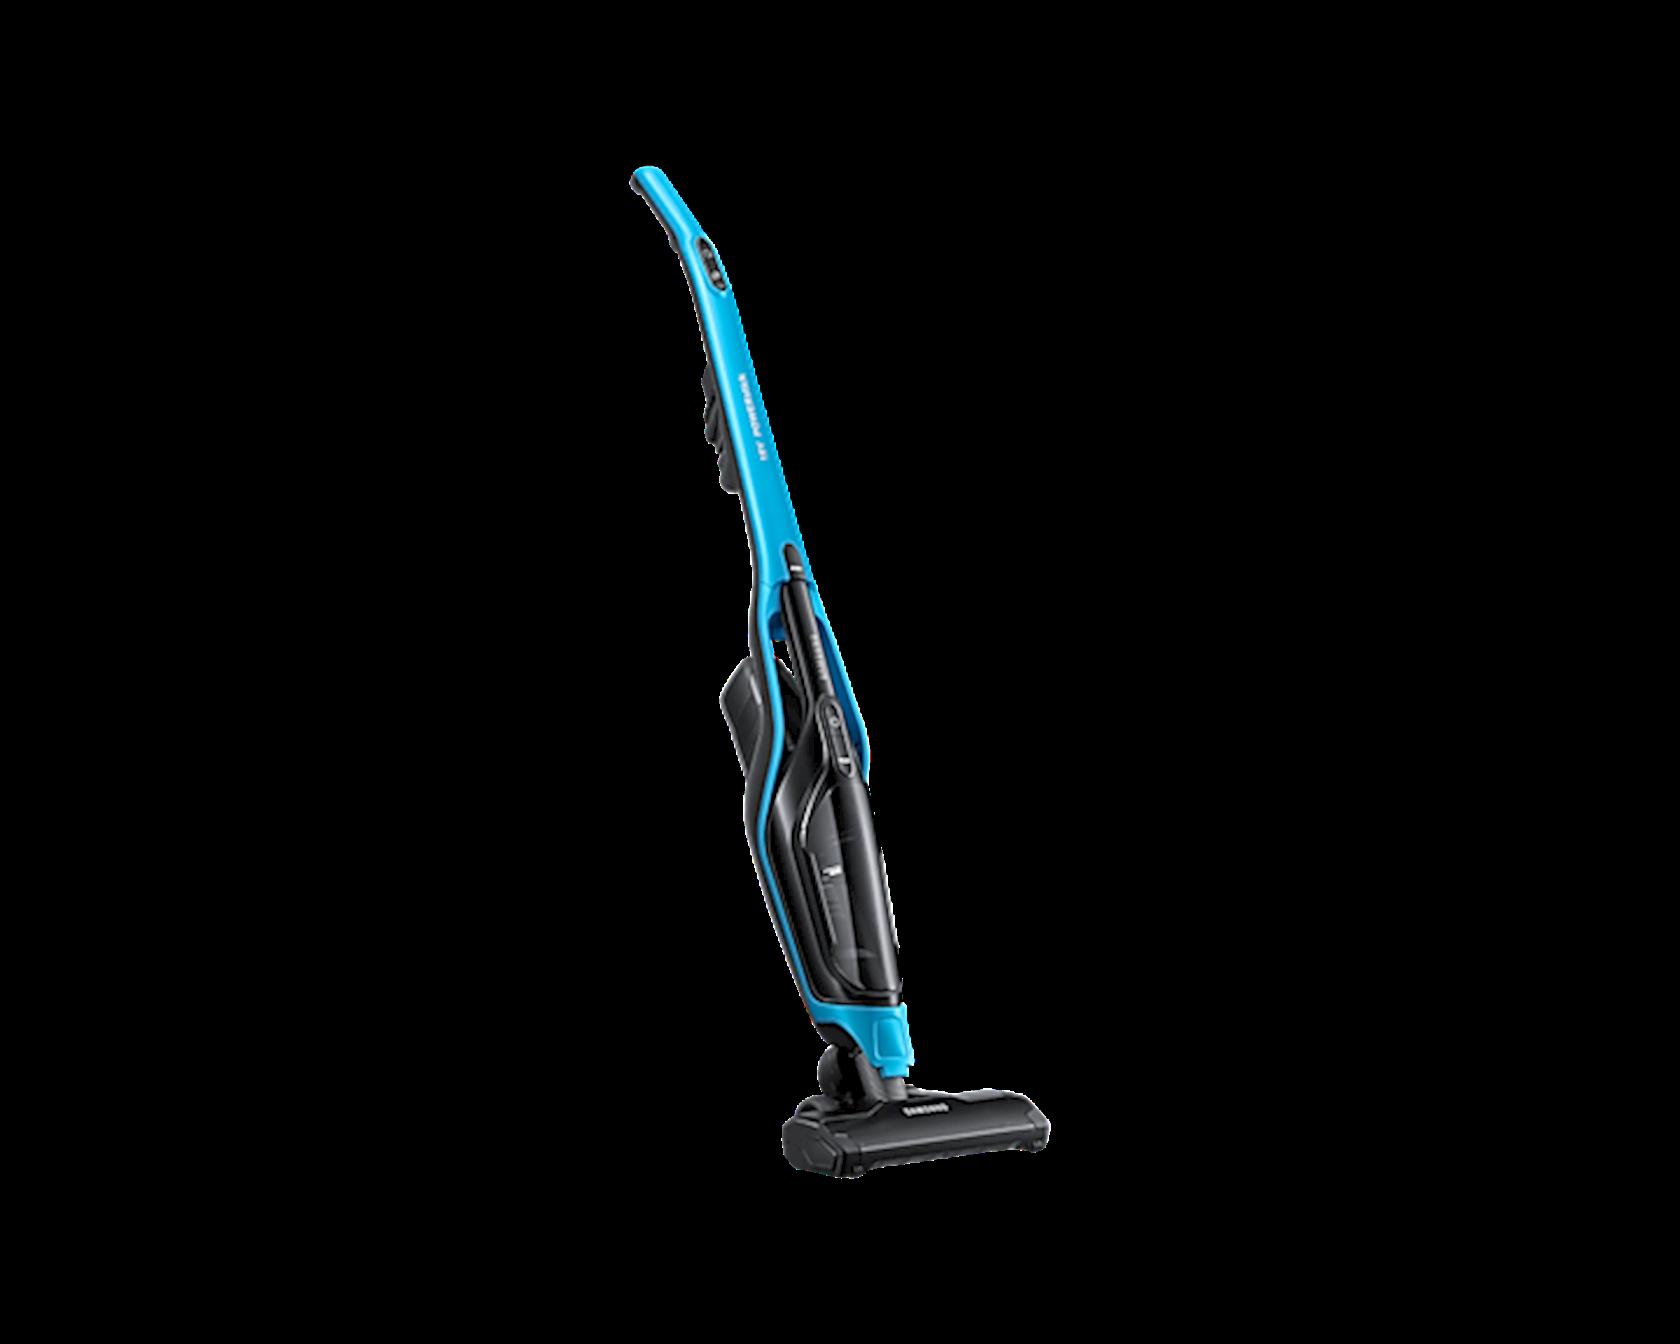 Vertikal tozsoran Samsung VS60M6015KA/EV, Mavi